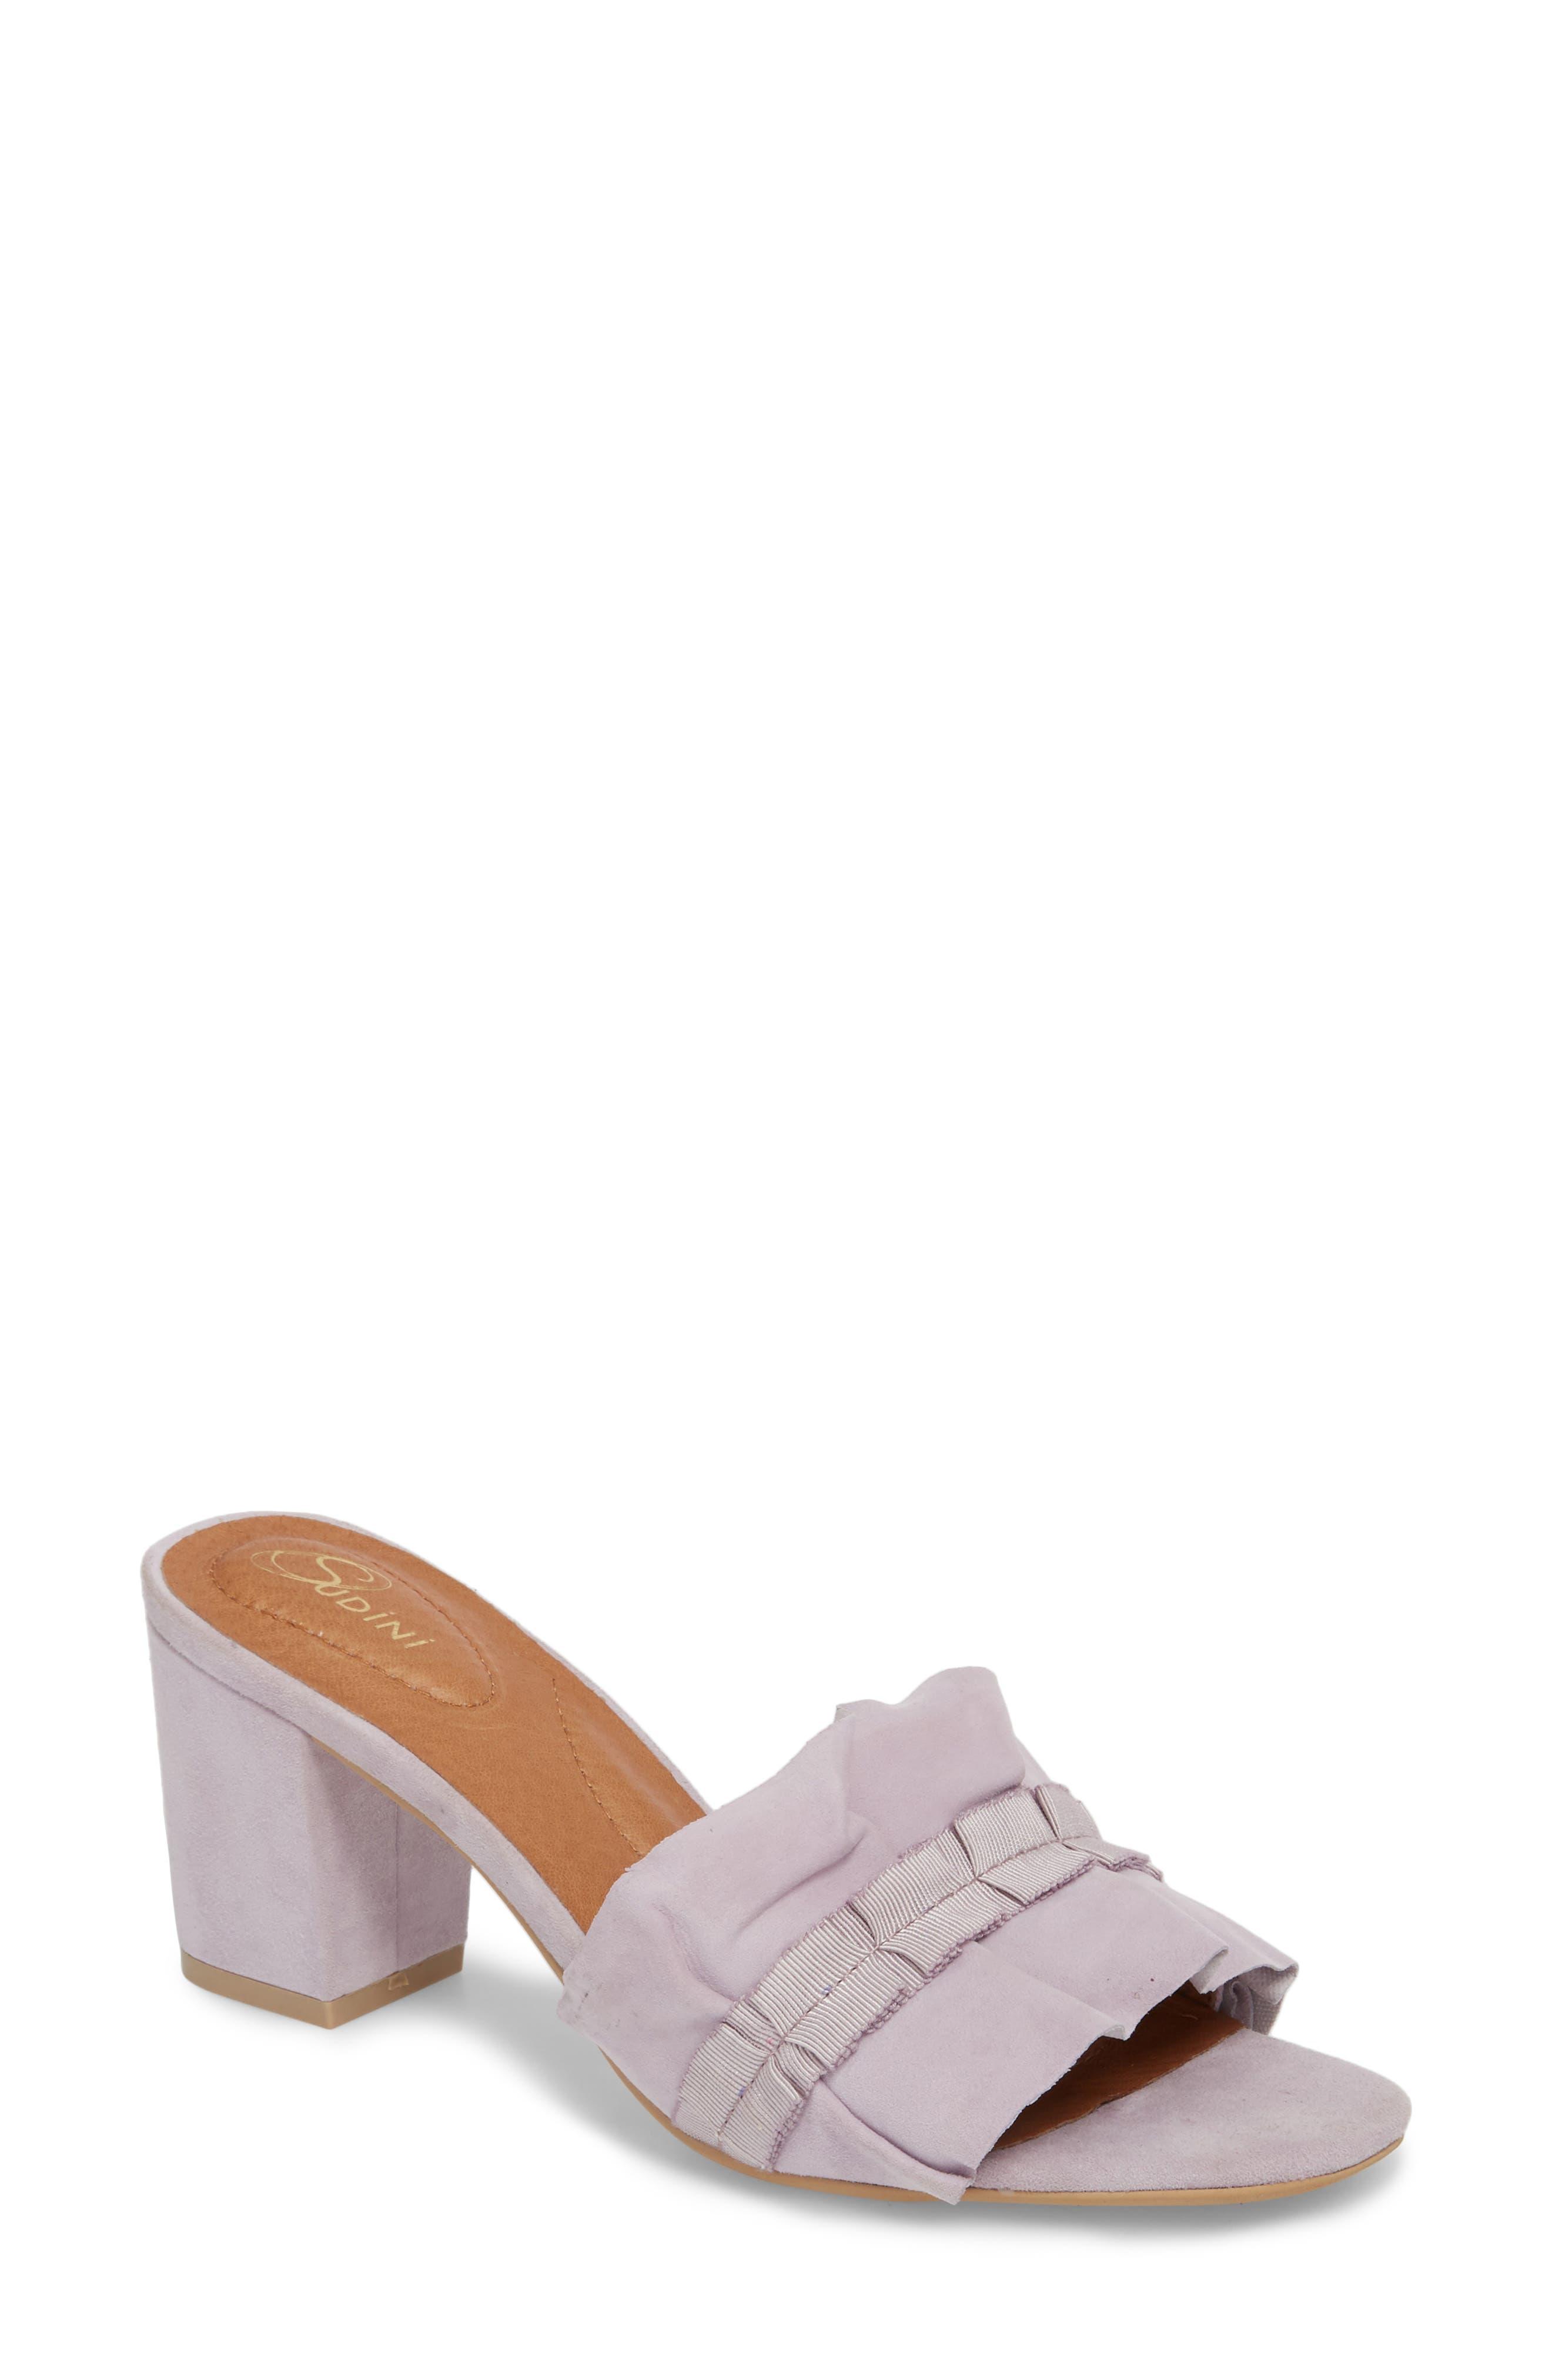 SUDINI Women's Nea Sandal 1mOYz